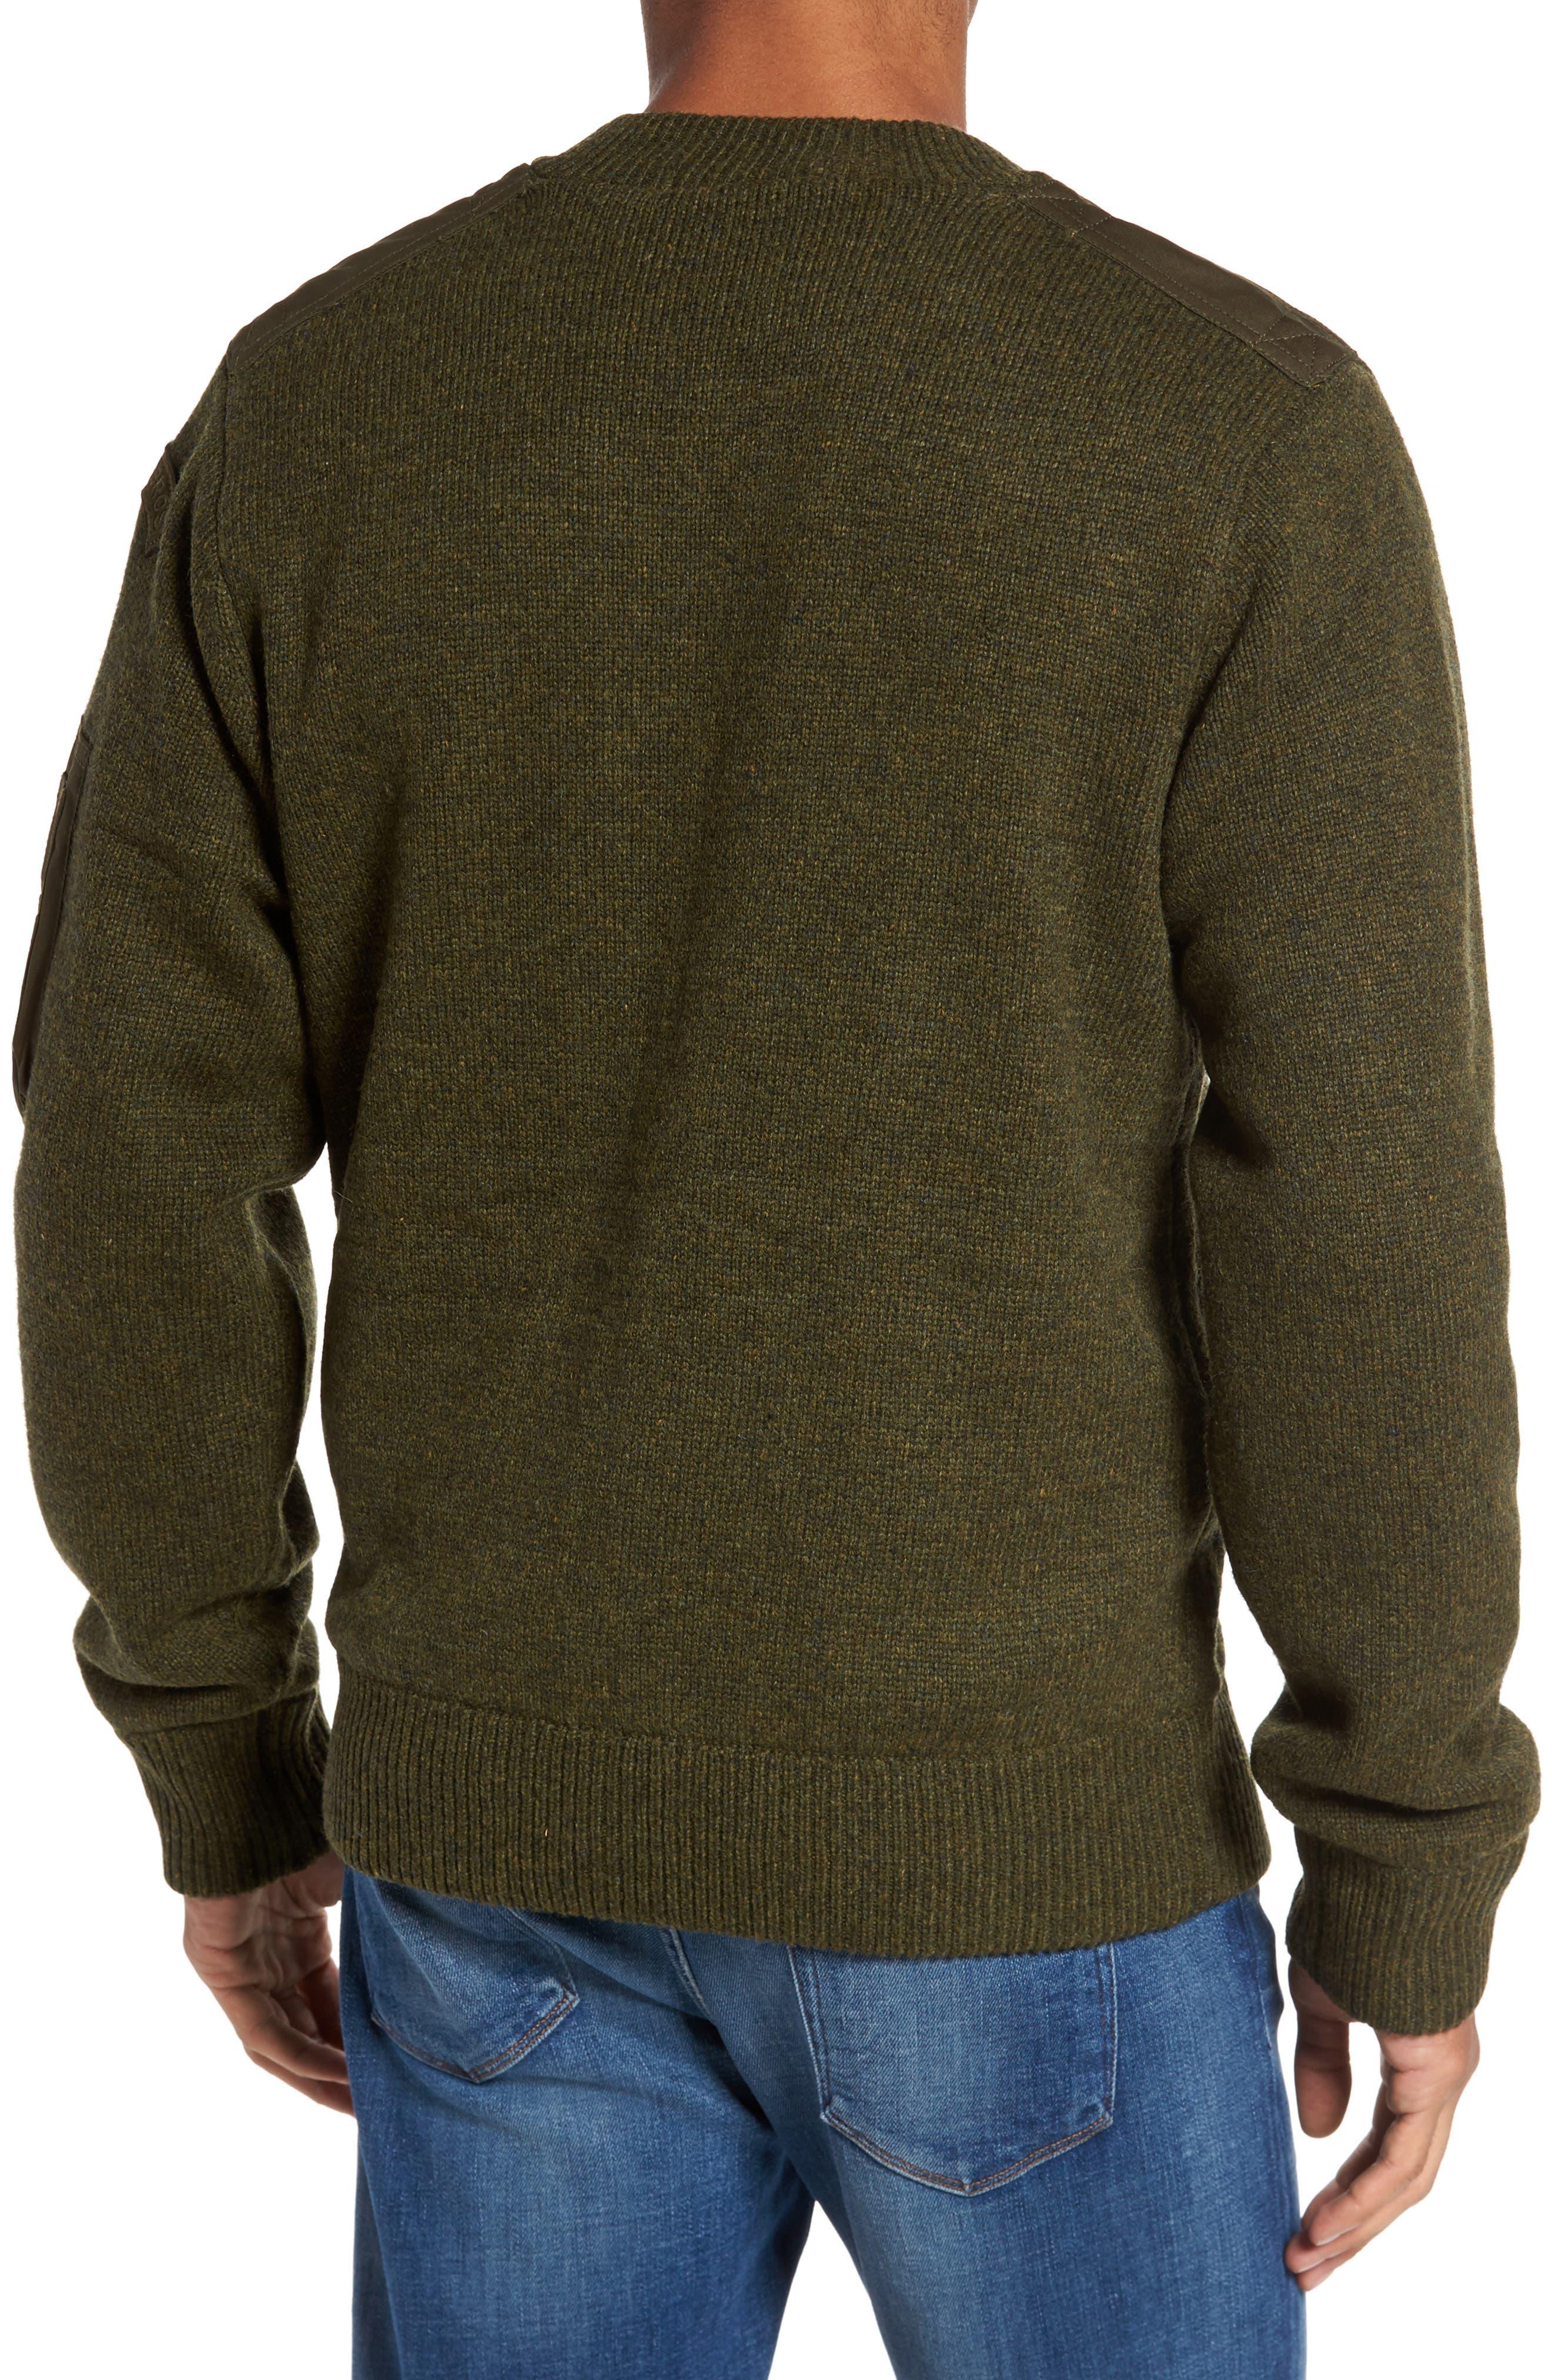 MA-1 Sweater Jacket,                             Alternate thumbnail 2, color,                             MOSS GREEN